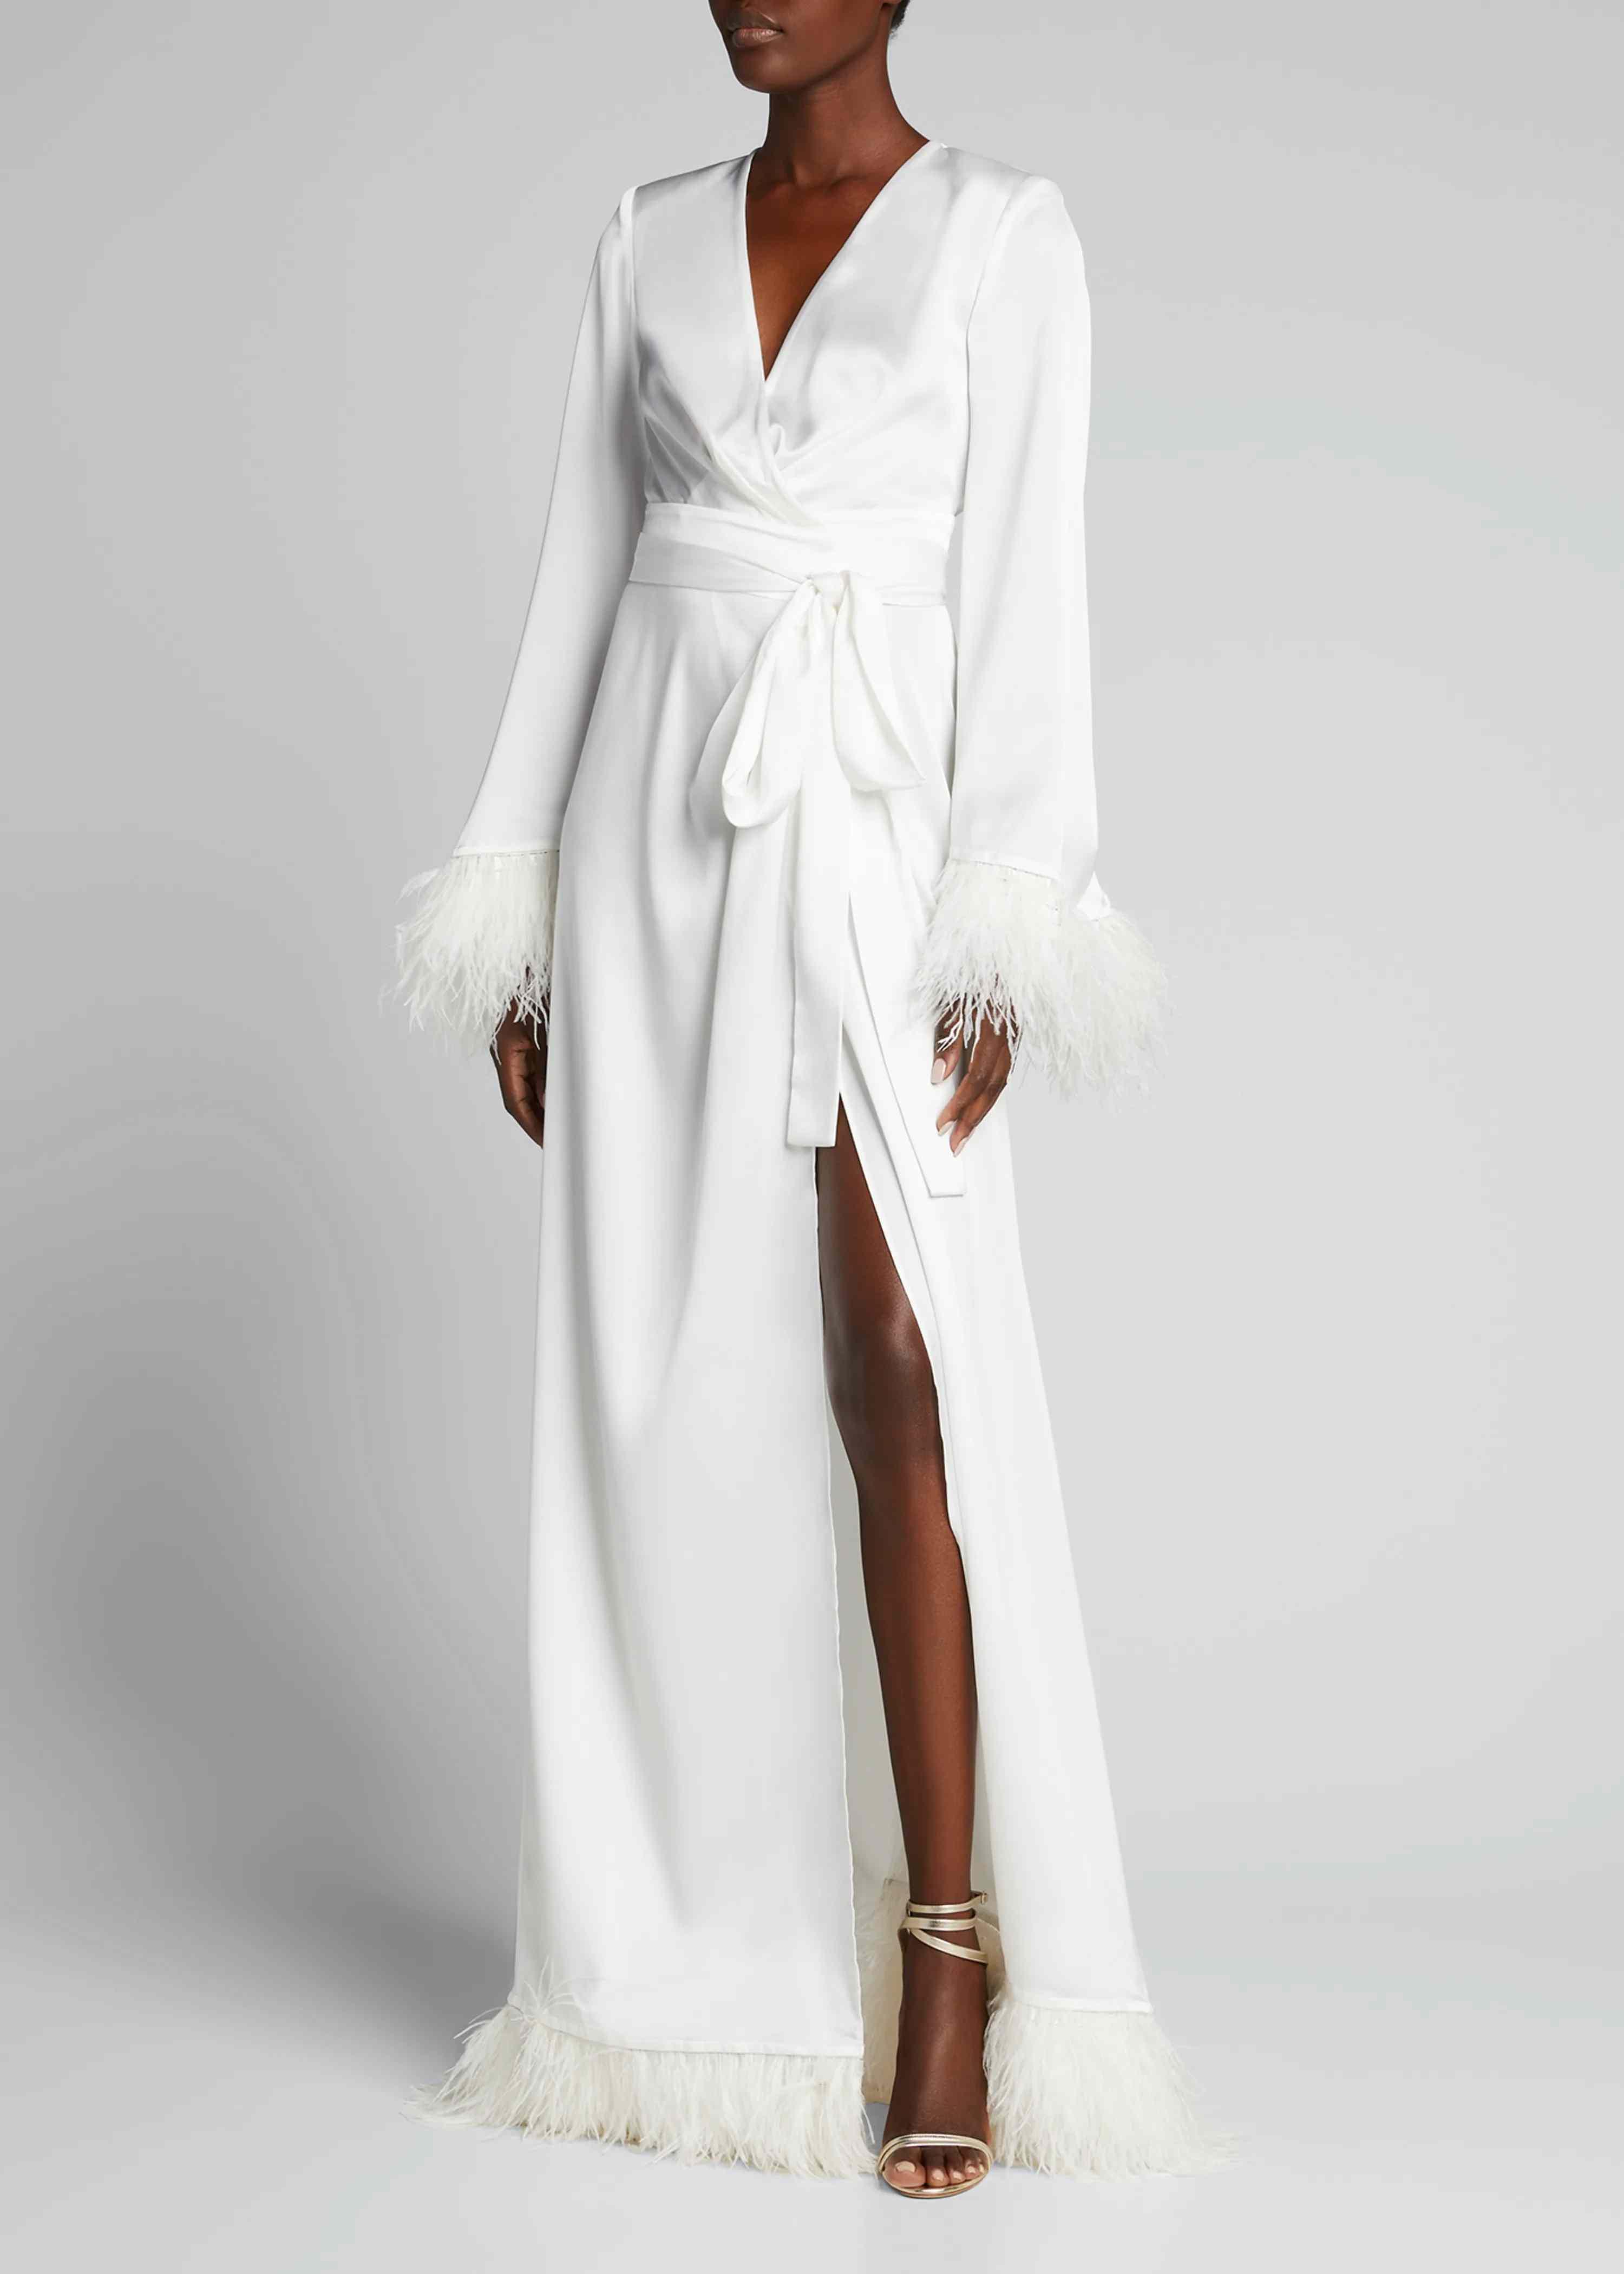 Feather Trim Satin Robe Gown